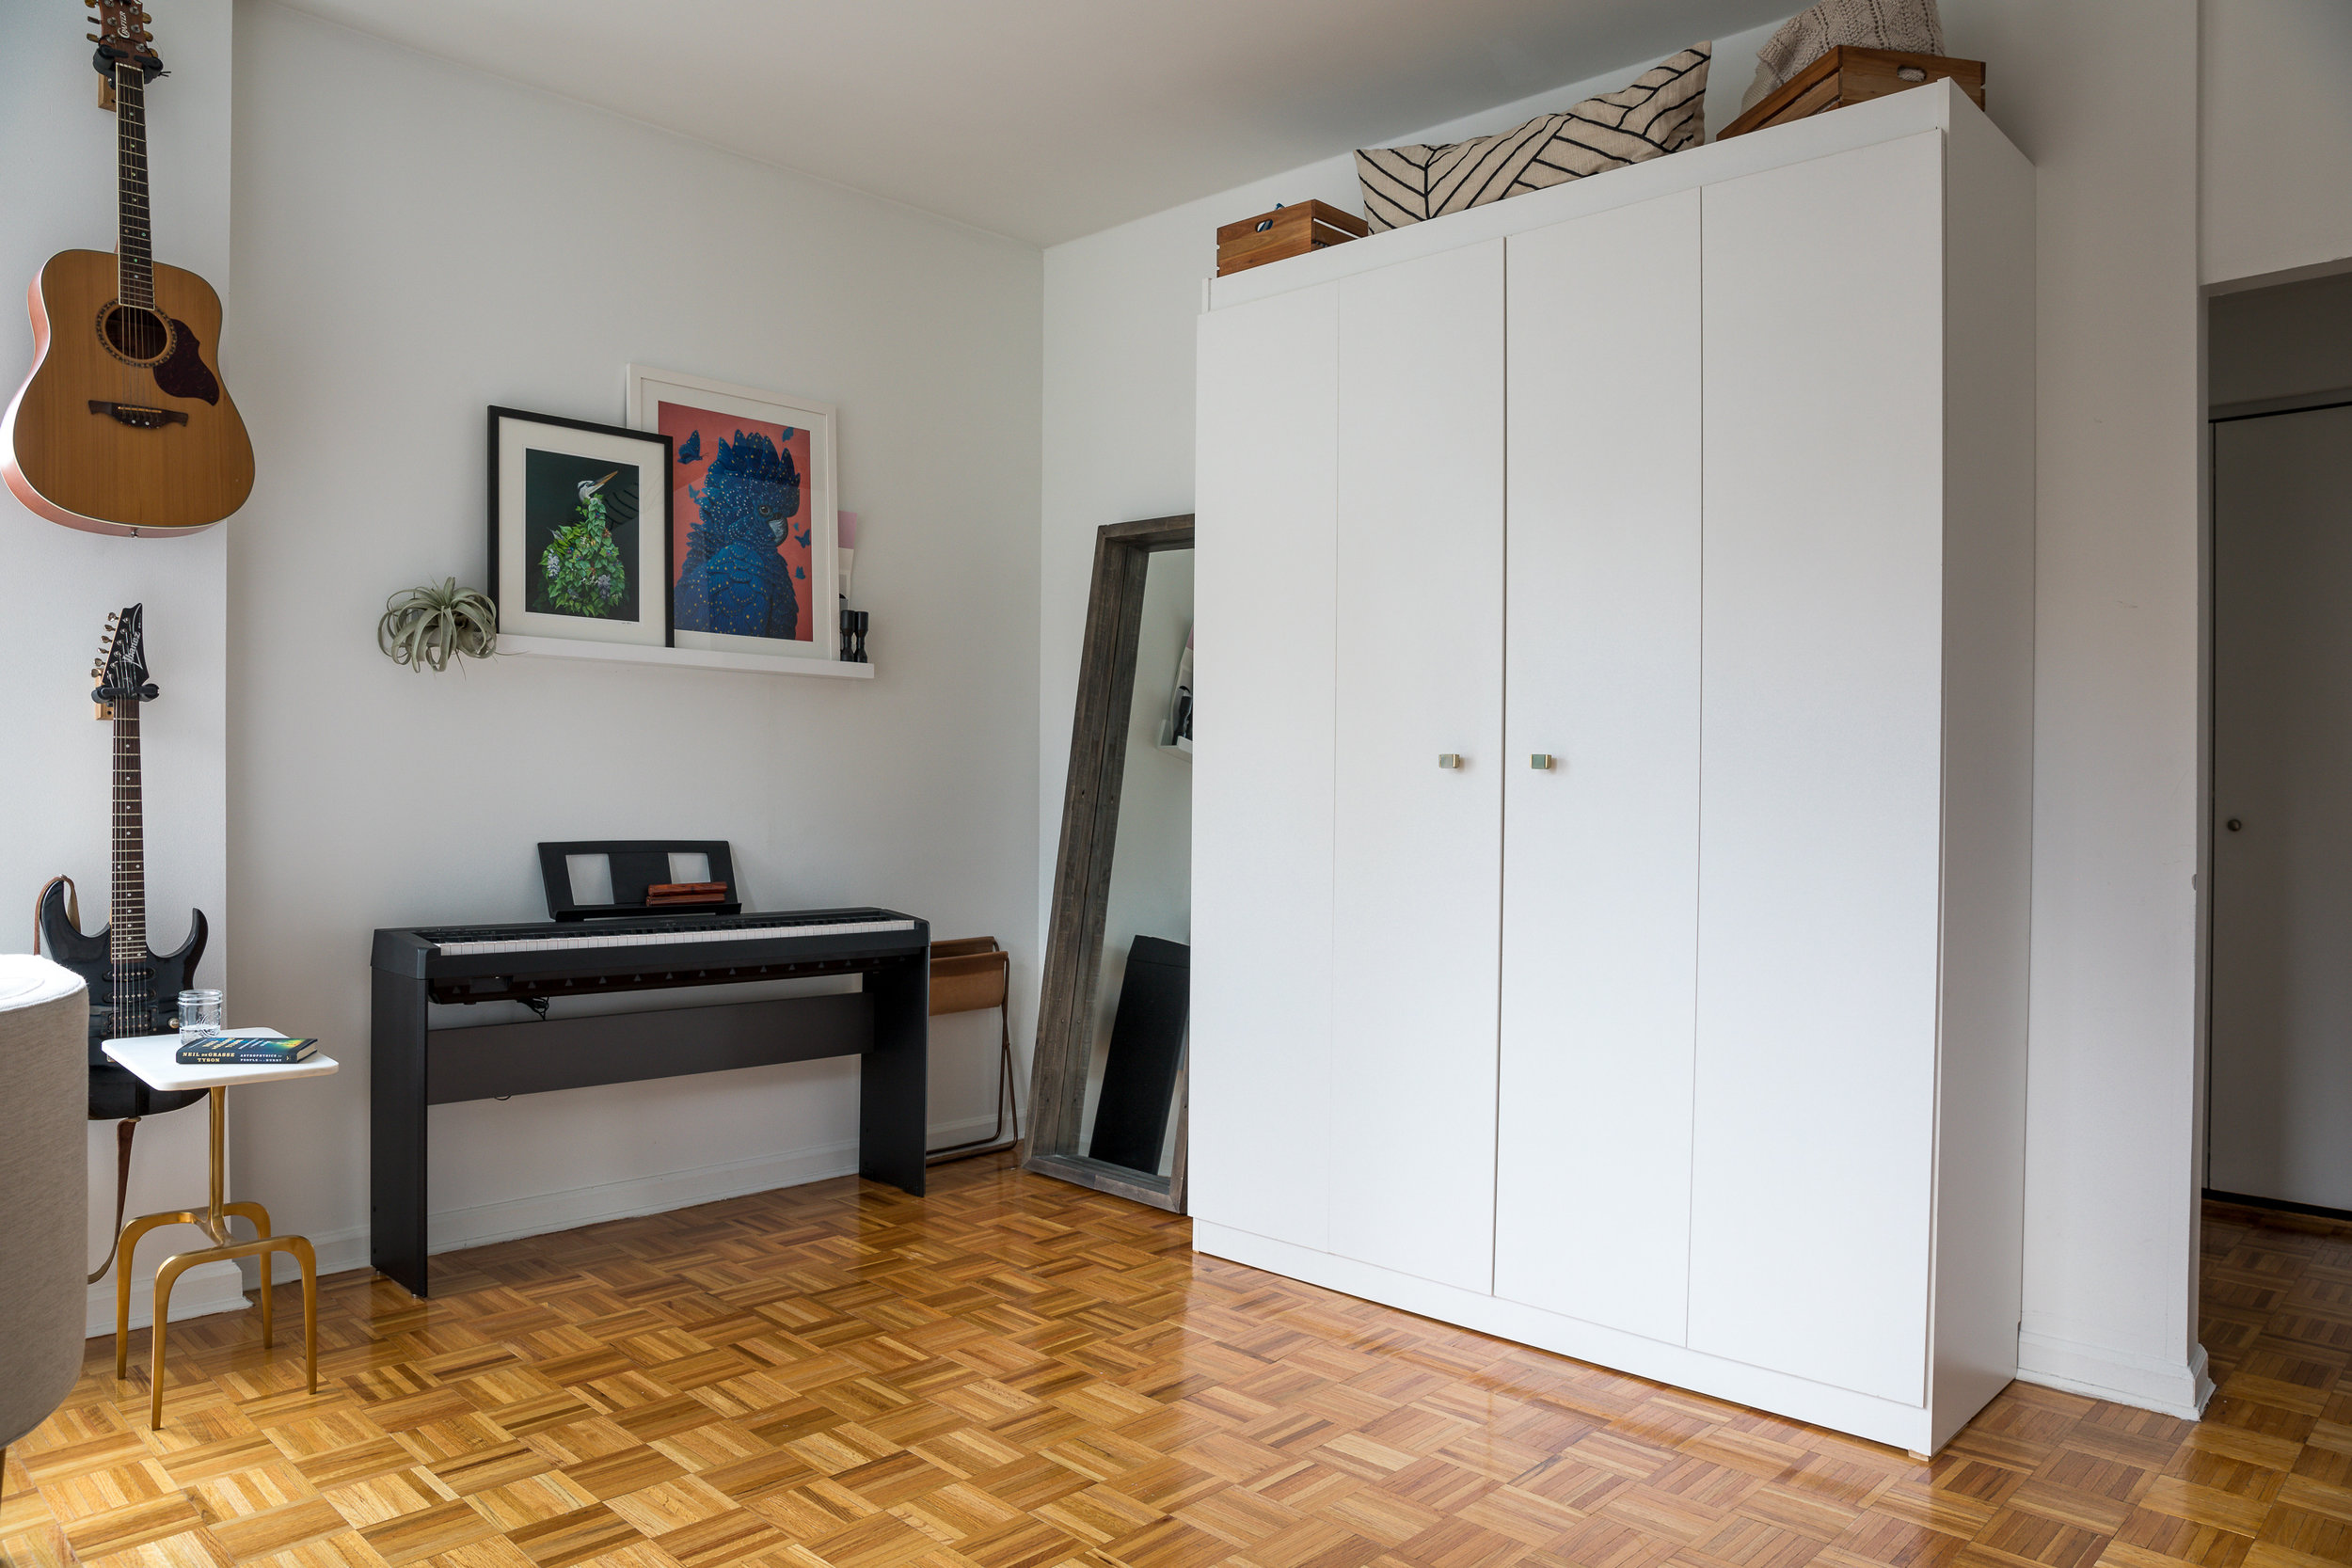 Wall Bed / Murphy Bed - put away